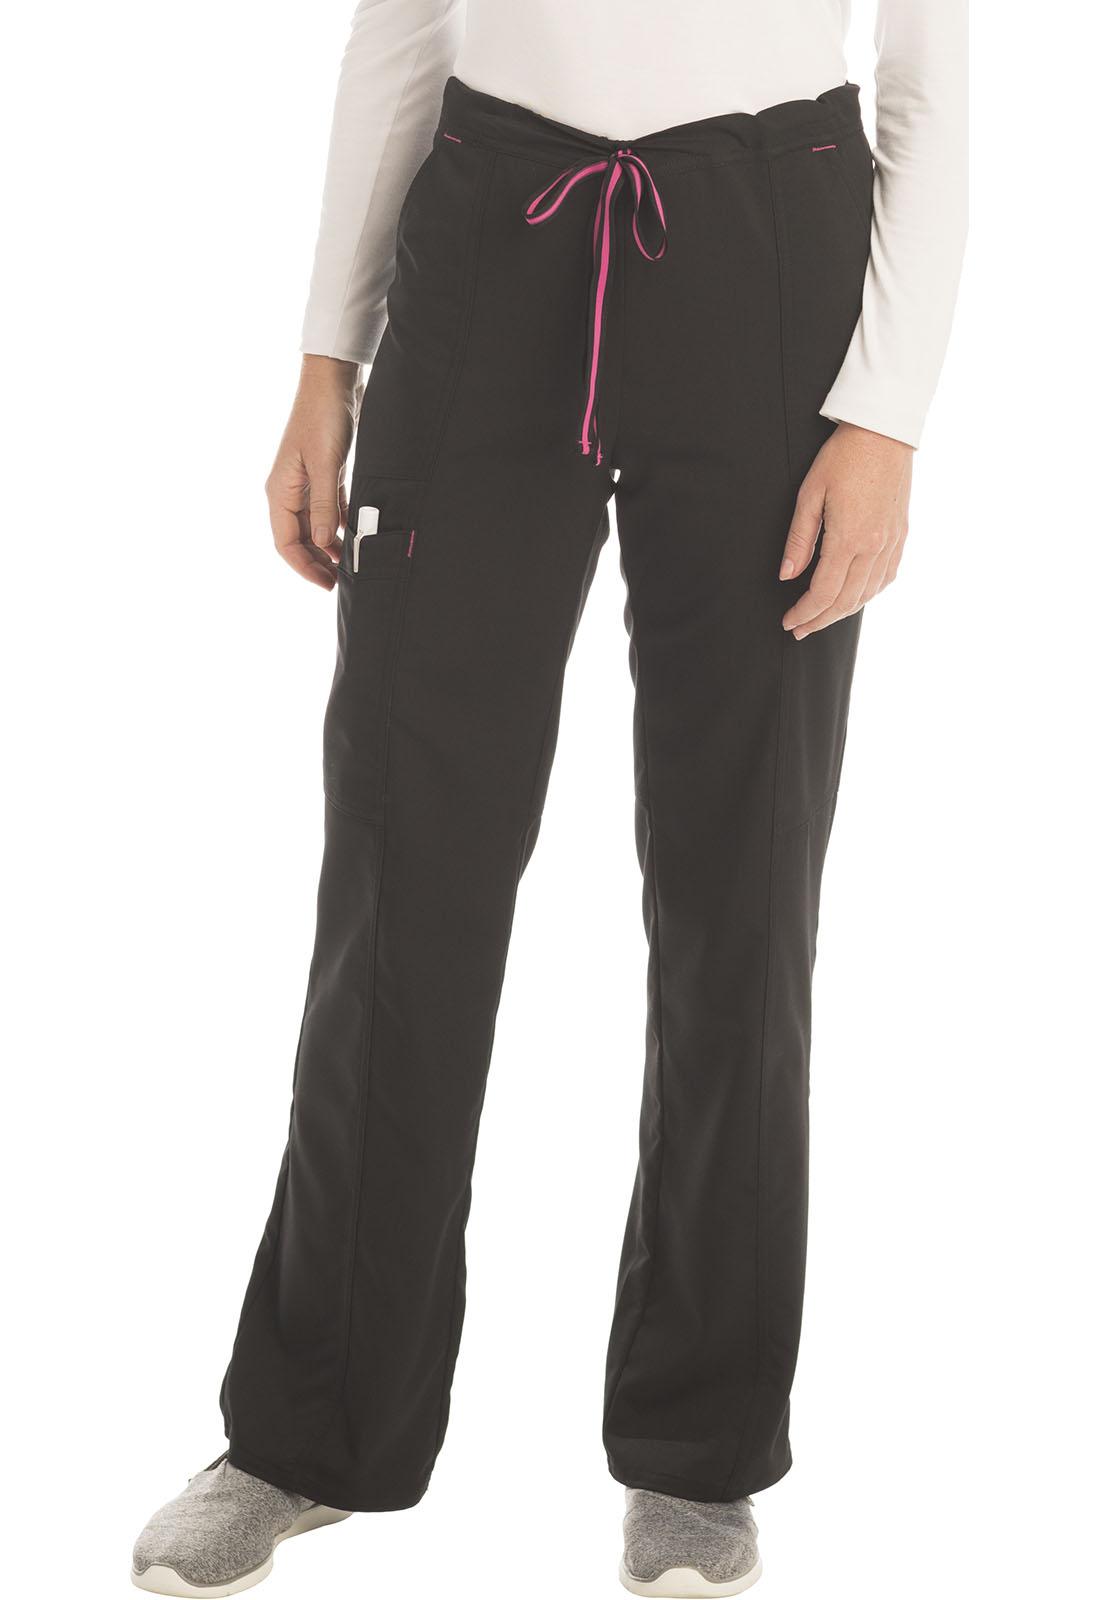 1c66e1d9451 Women's Stretch Rayon Drawstring Pant WM007-CRWM from Scrubstar